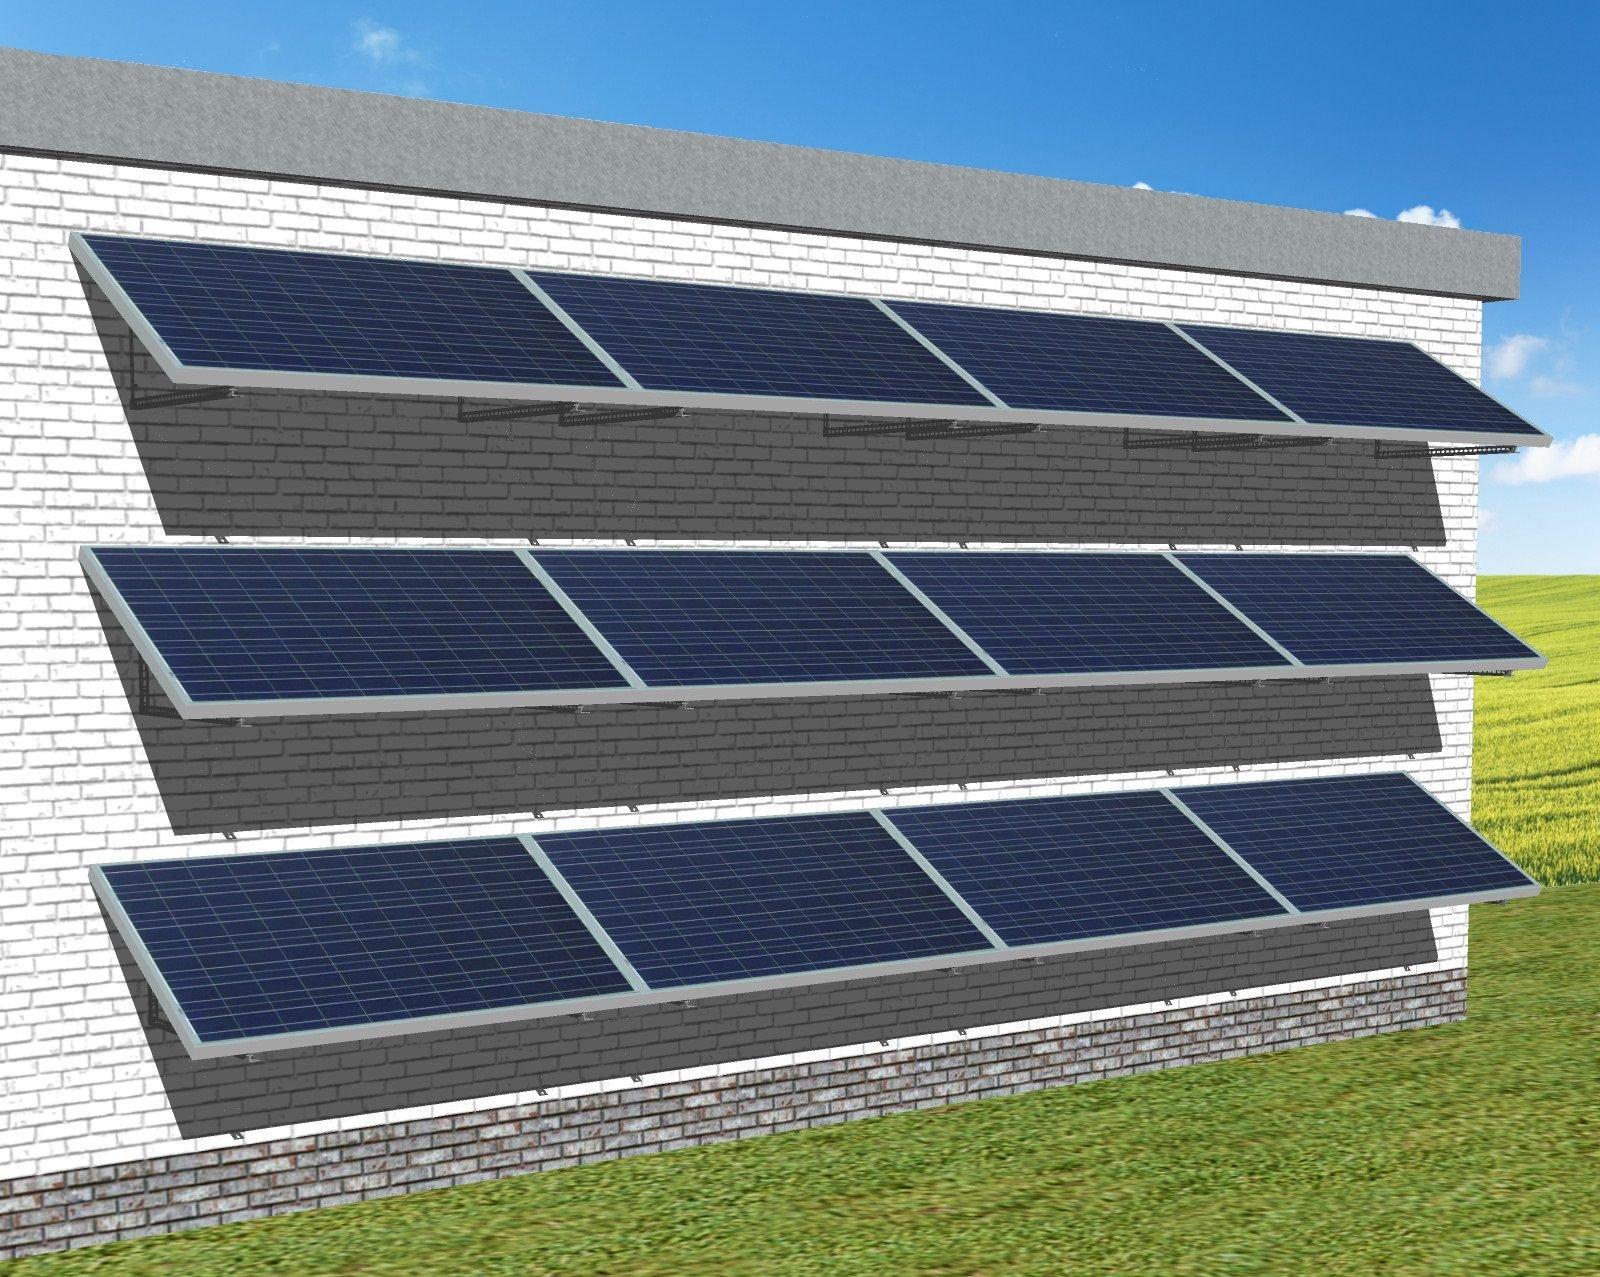 myCleantech-Solar.org Solaranalage Fassade oder Carport mit 12 Pannels